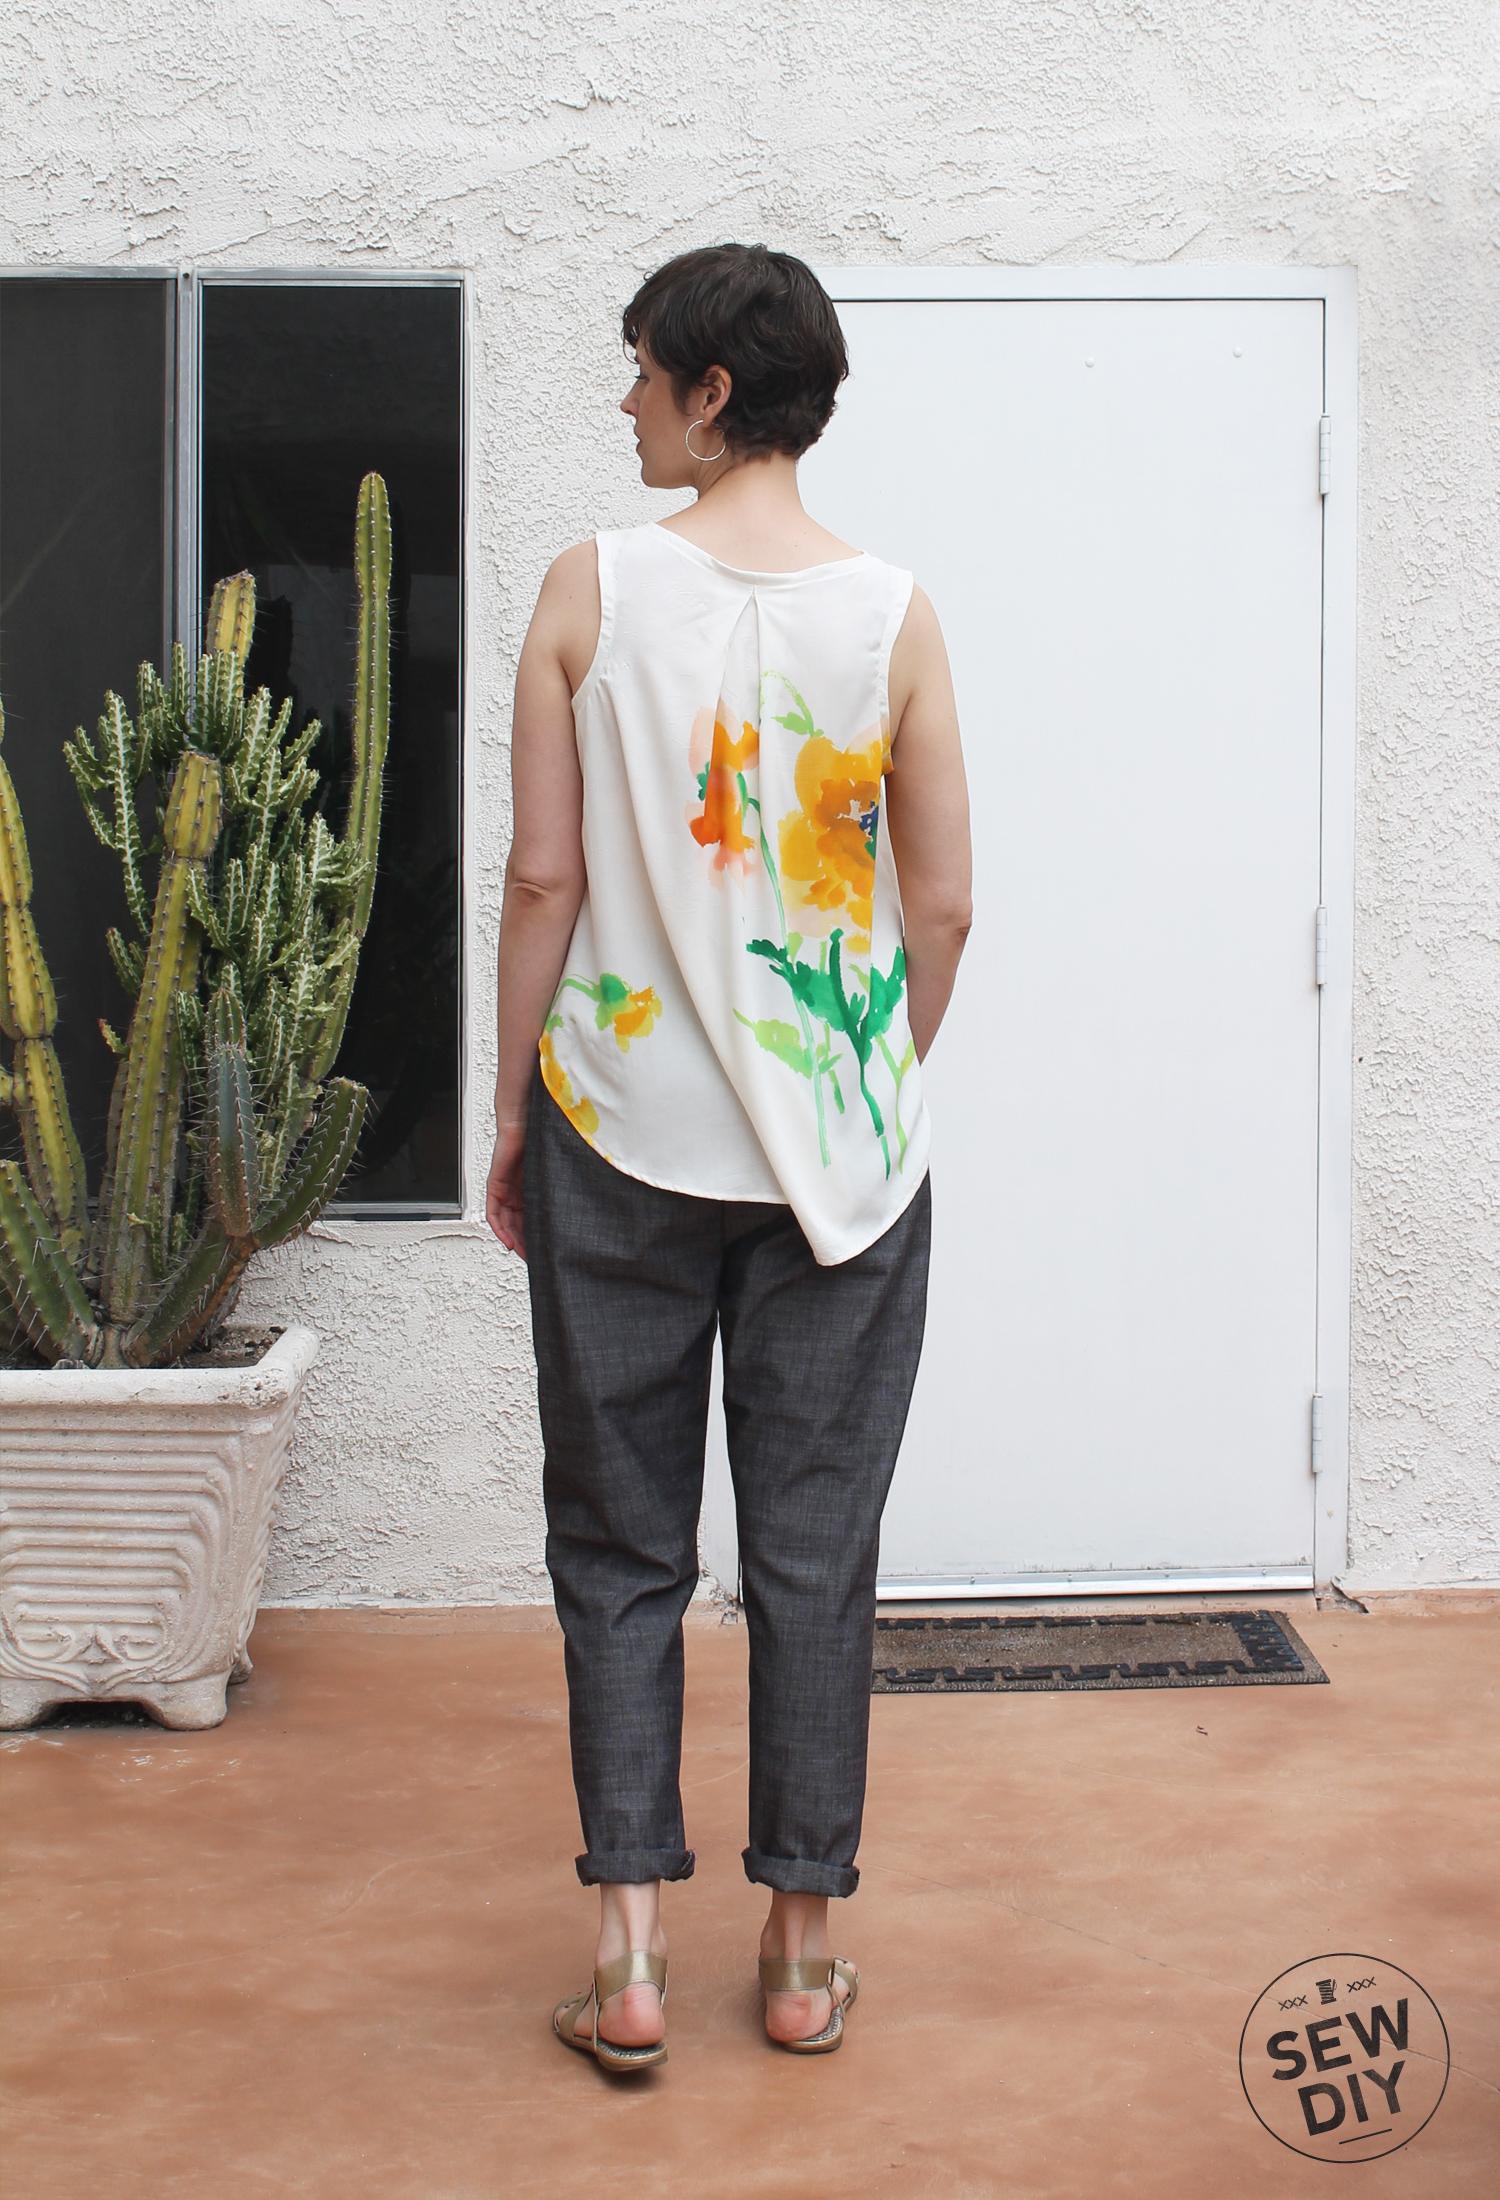 DIY High Waisted Pants Back View – Sew DIY